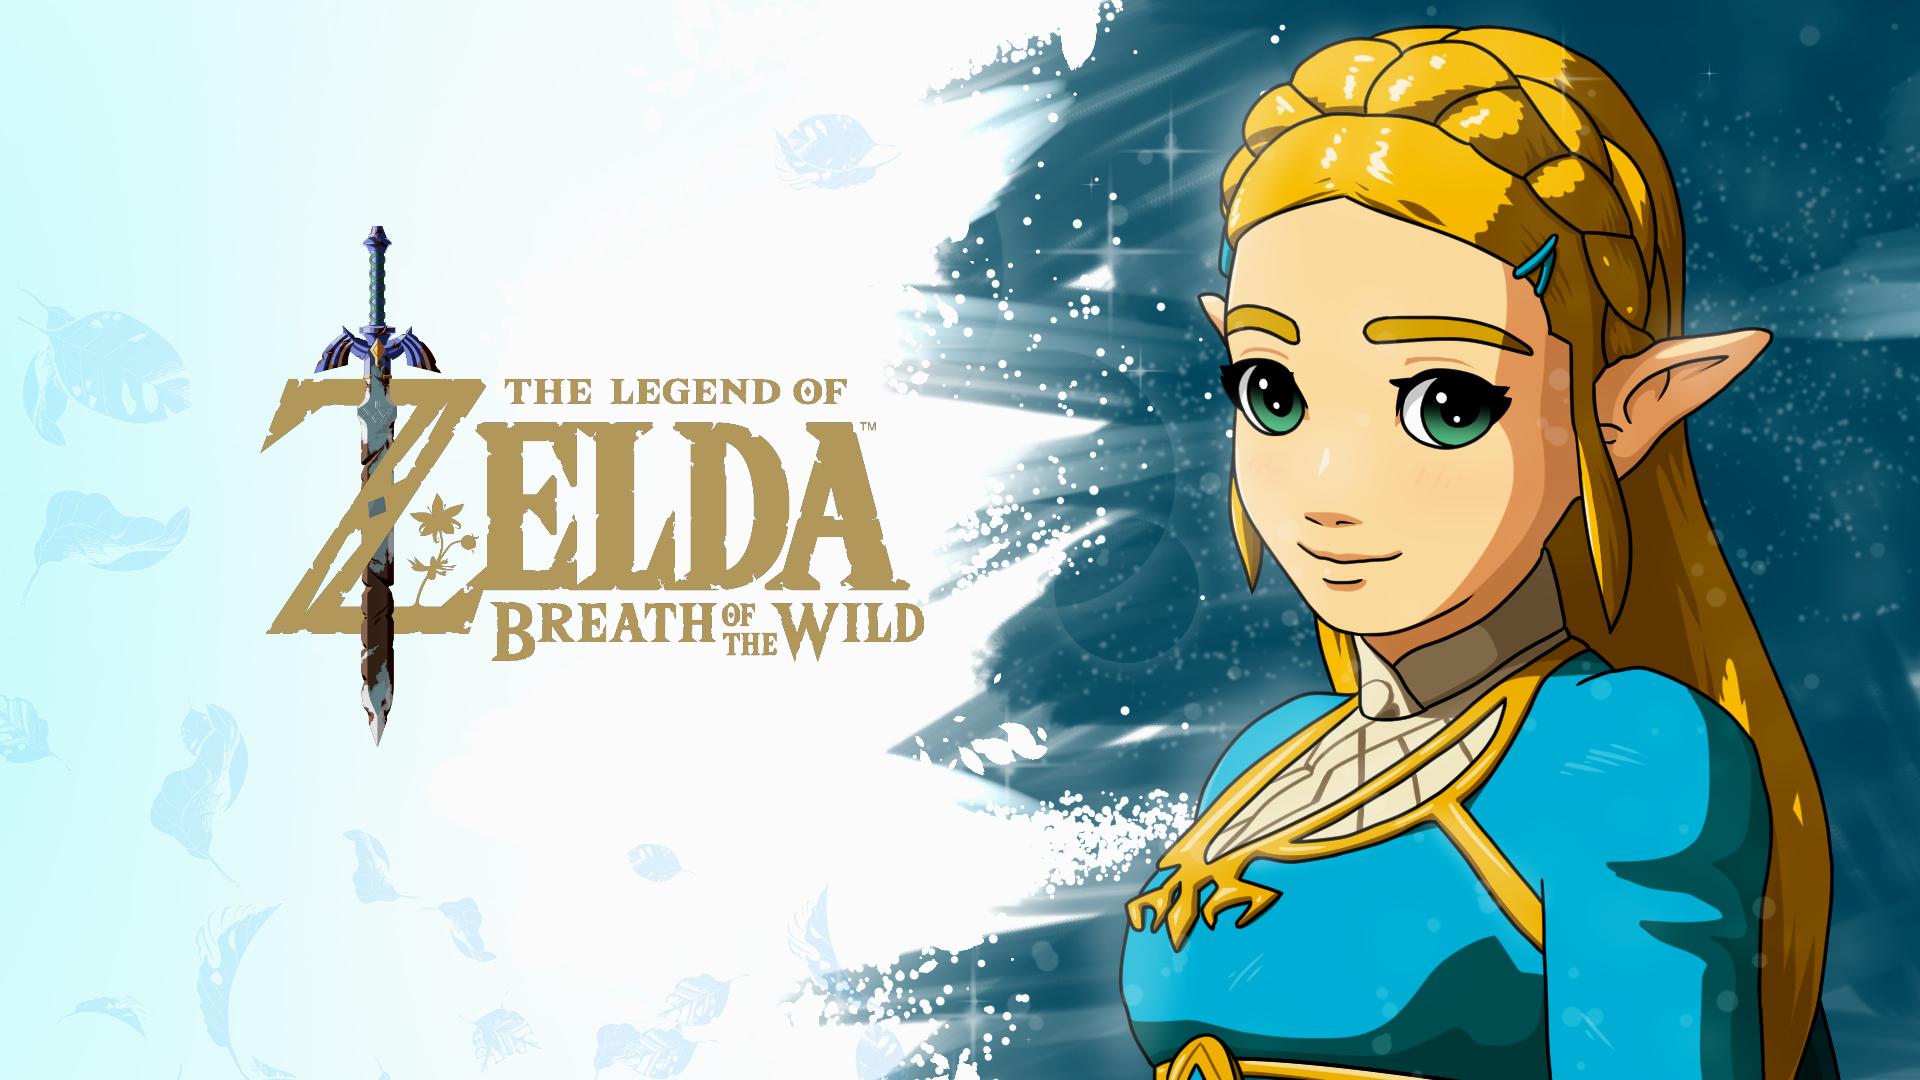 Breath Of The Wild Zelda Wallpaper By Nkosi8cake On Deviantart